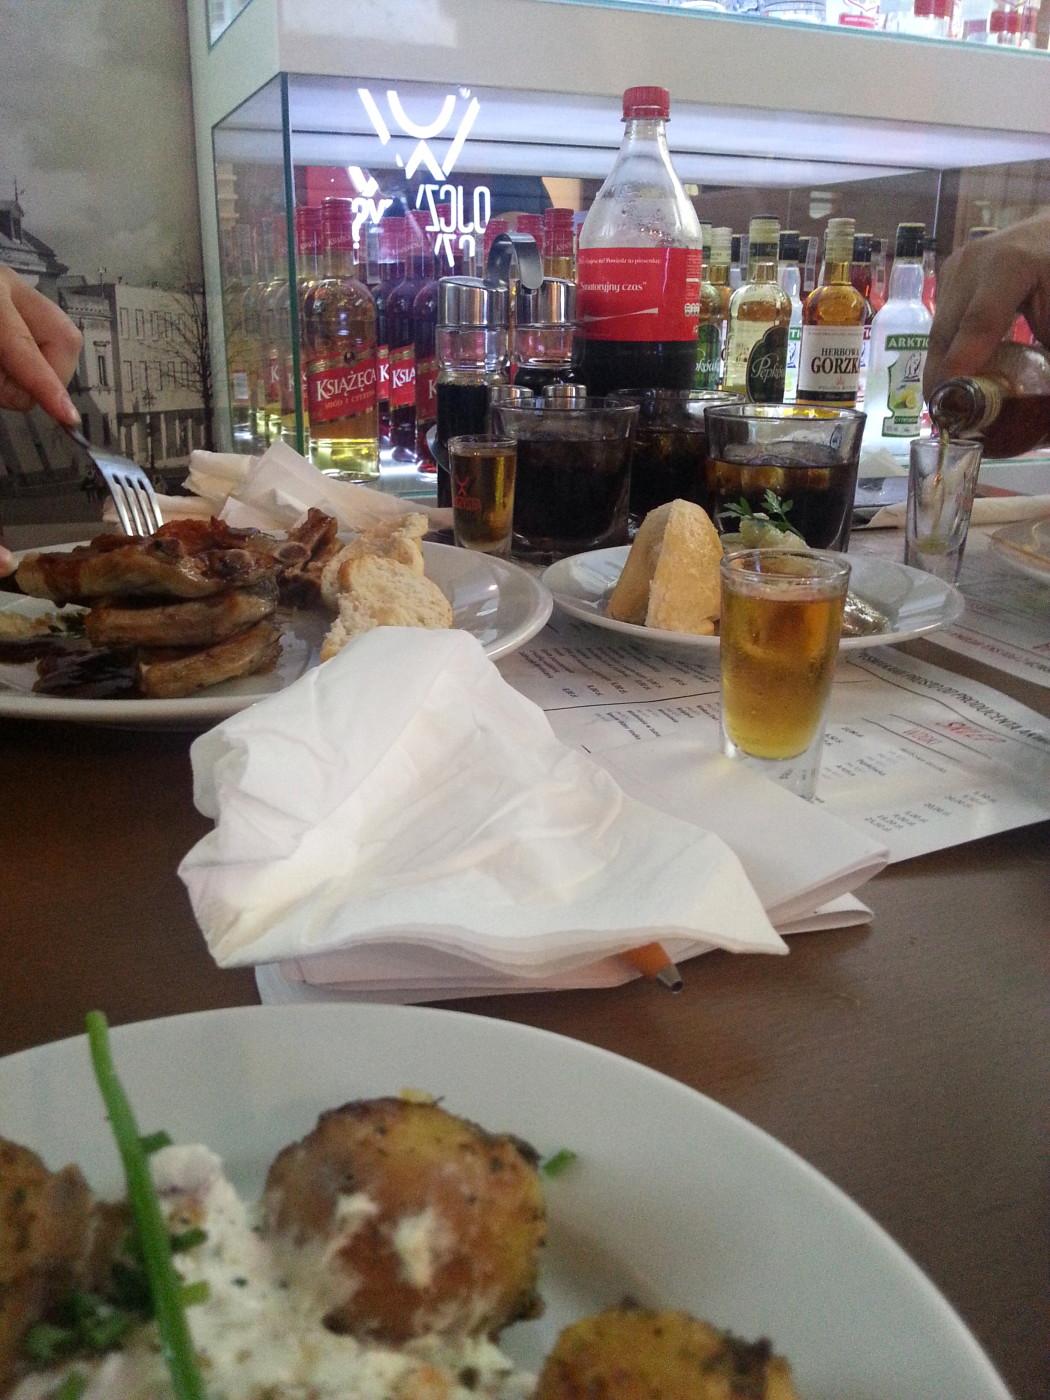 http://streetfoodpolska.pl/web/wp-content/uploads/2015/02/20140725_191659-1050x1400.jpg